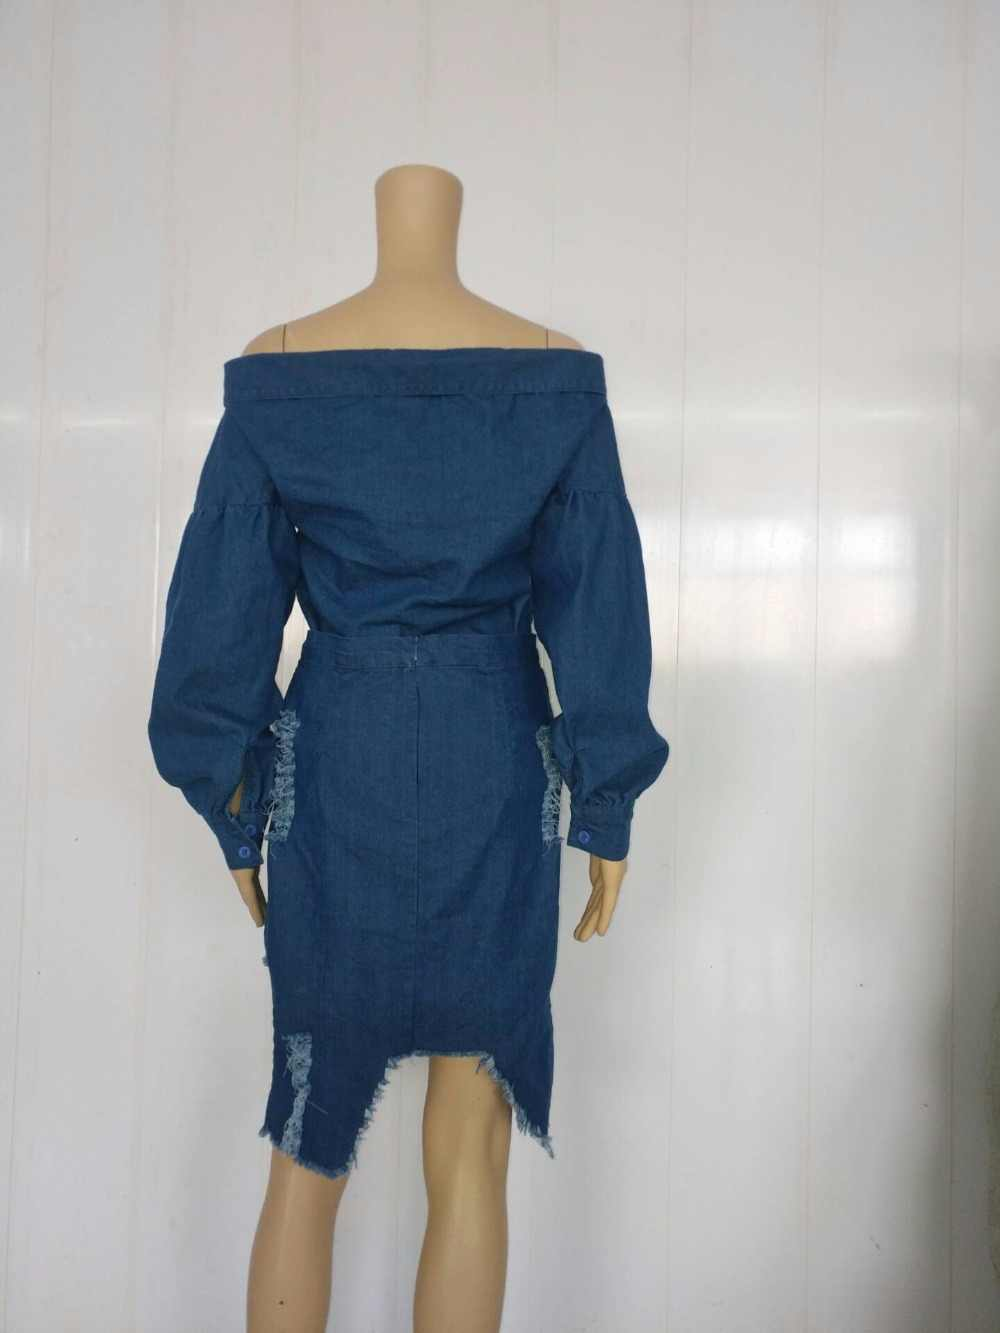 4ea1584936 ... European Foreign Trade Women Dress Sheath Party Cub Dress Off Shoulder  Denim Bodycon Jeans Dresses SY1128